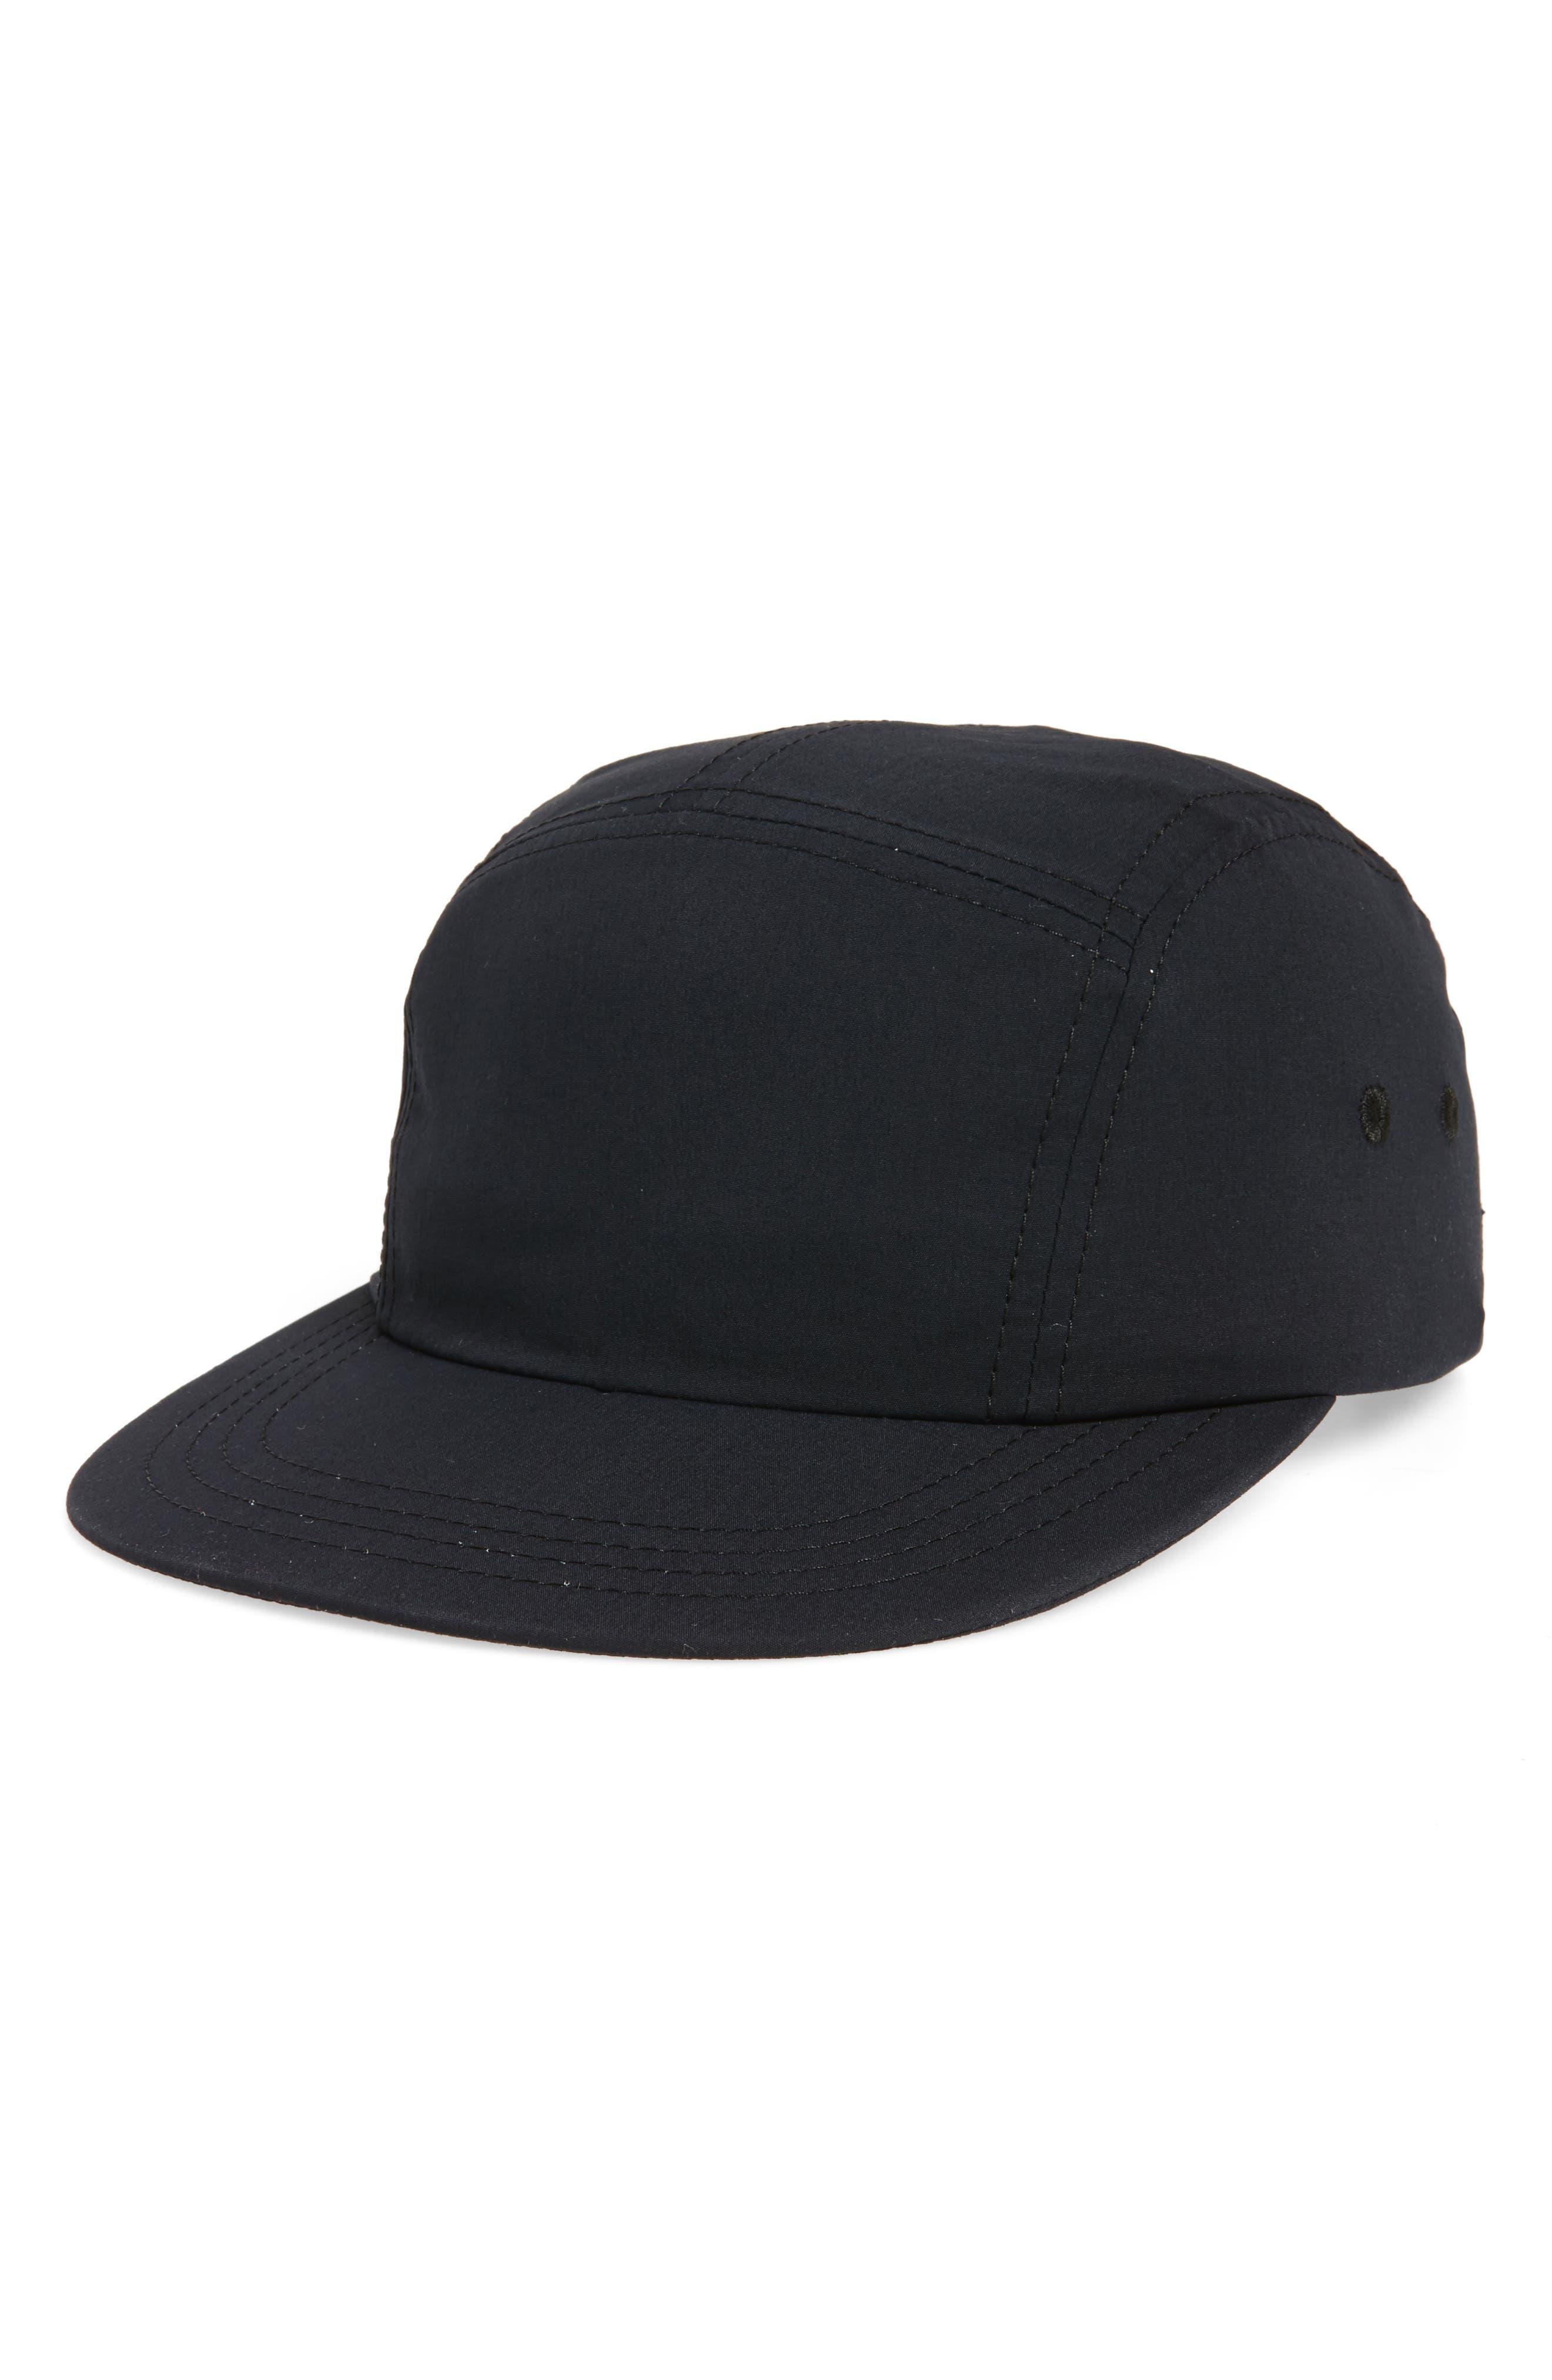 Main Image - Reigning Champ Five Panel Nylon Camp Hat